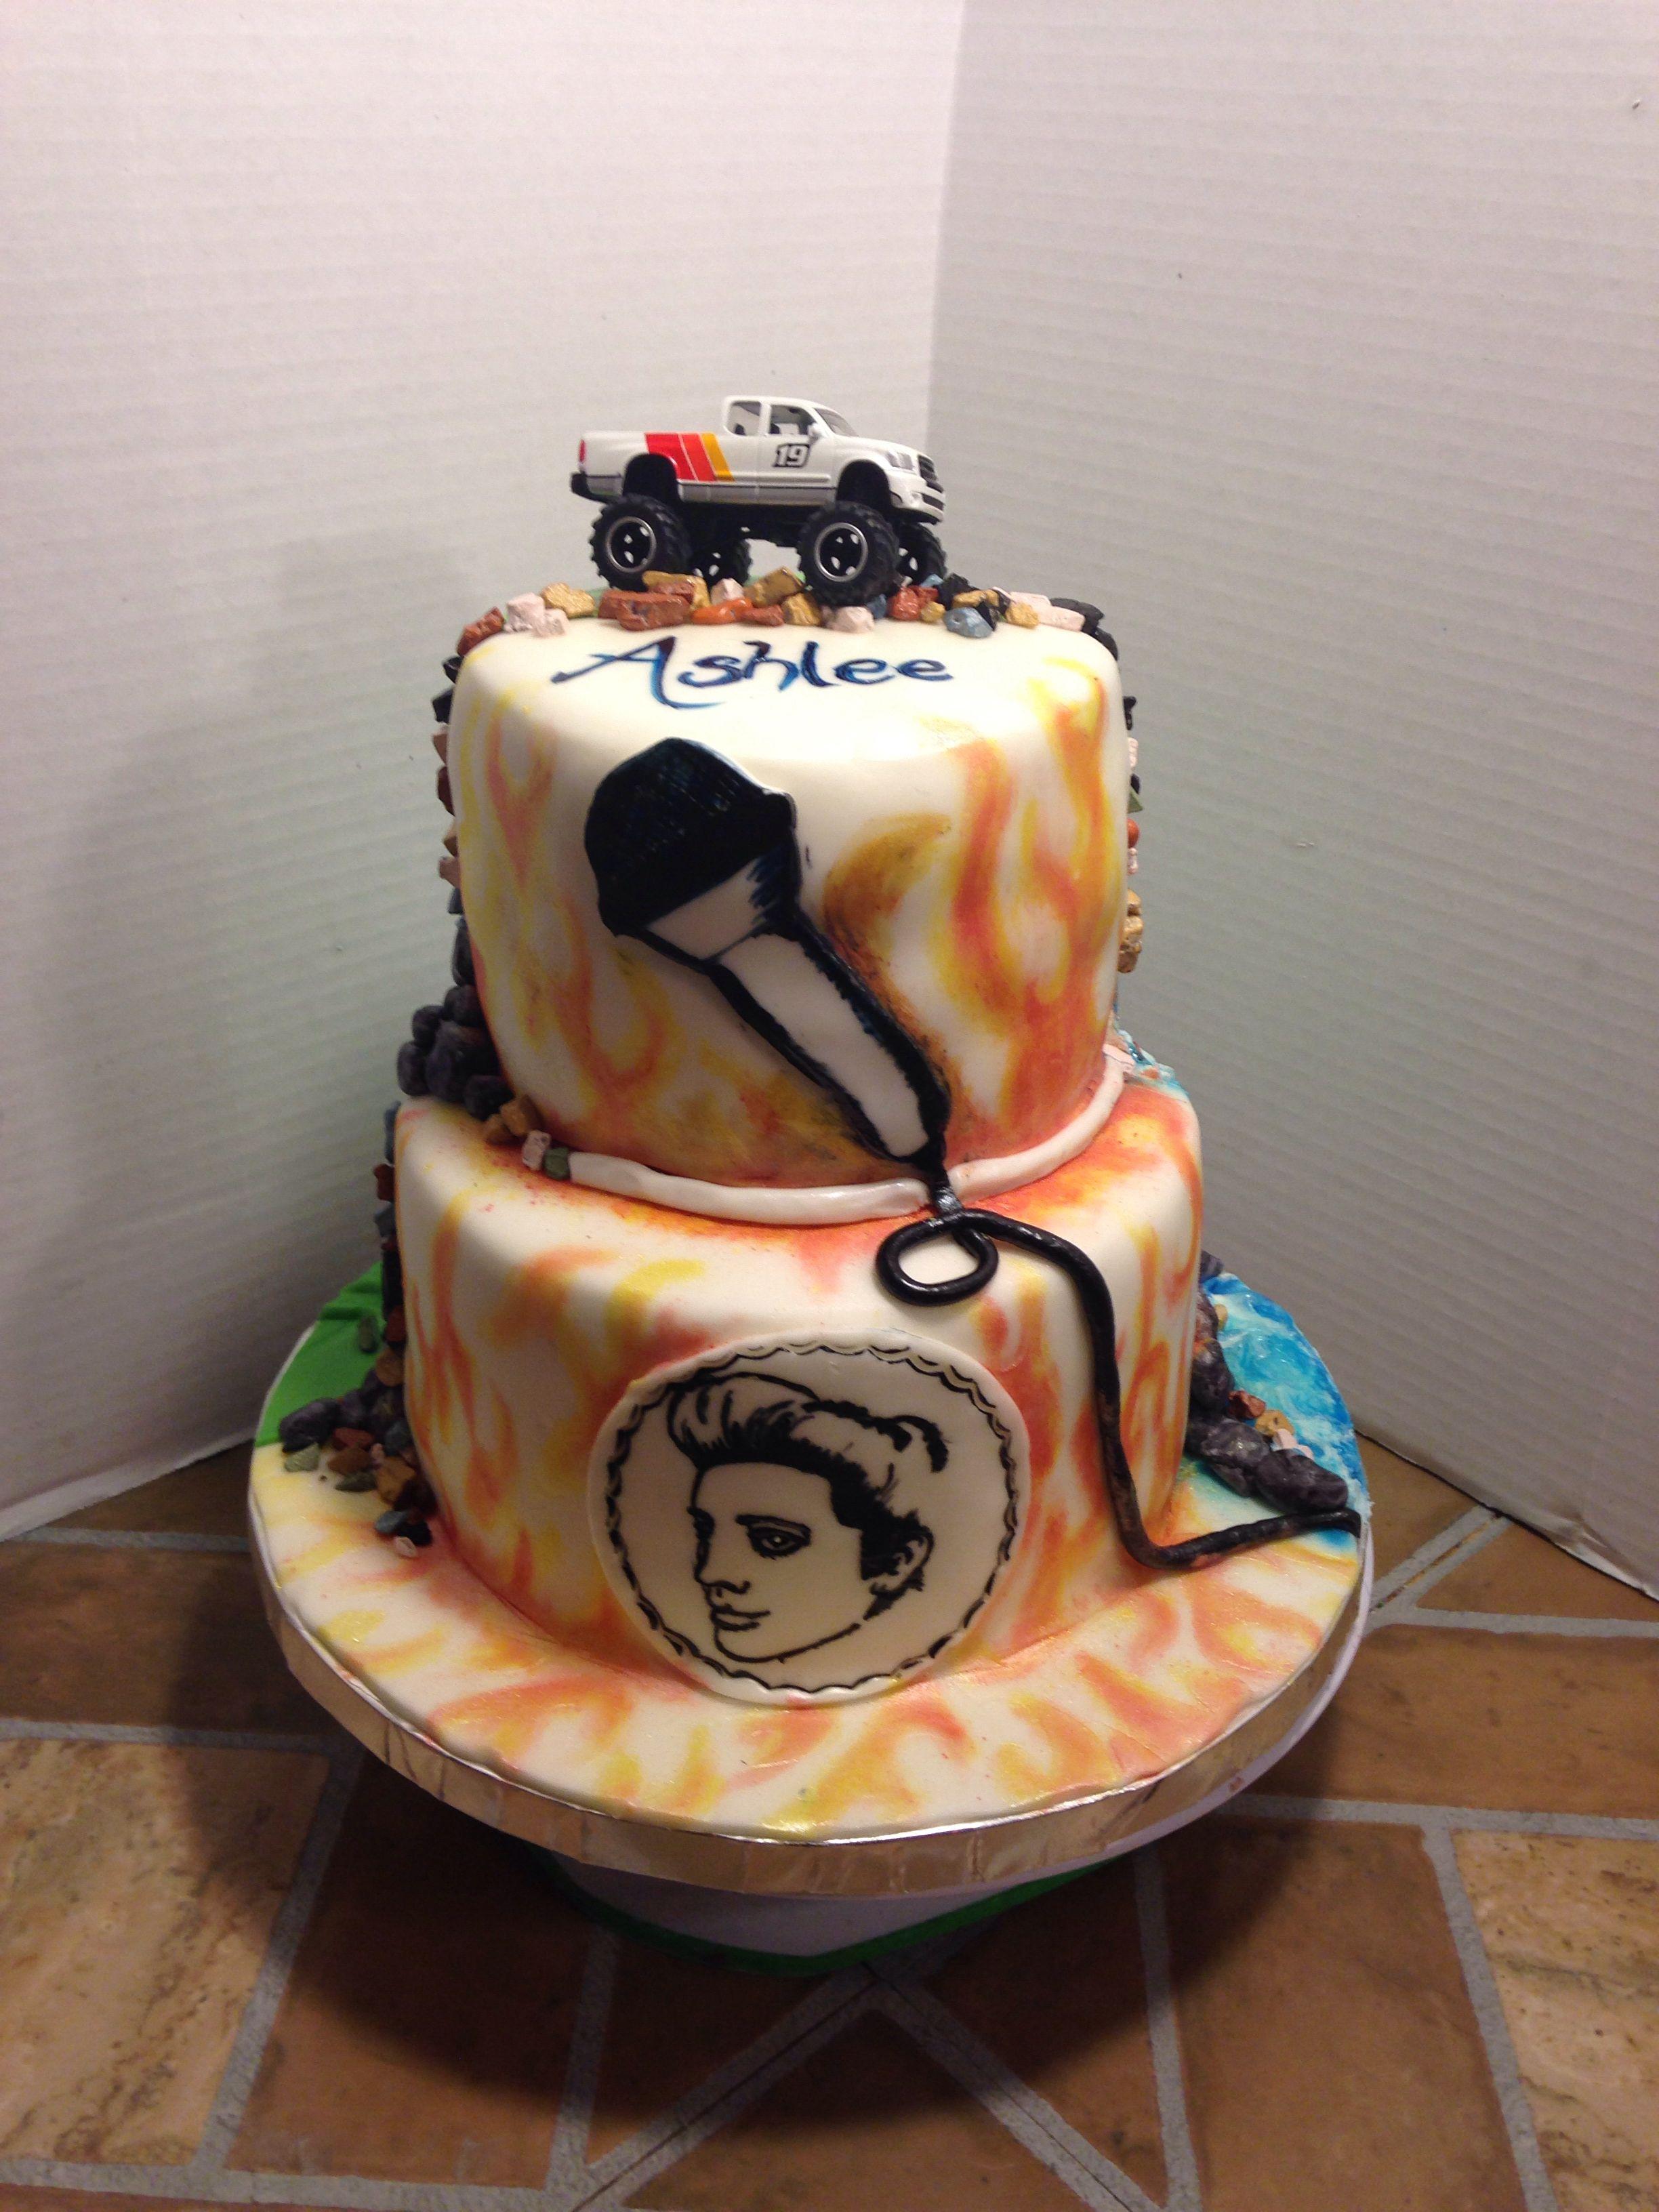 Elvis handpainted cake.